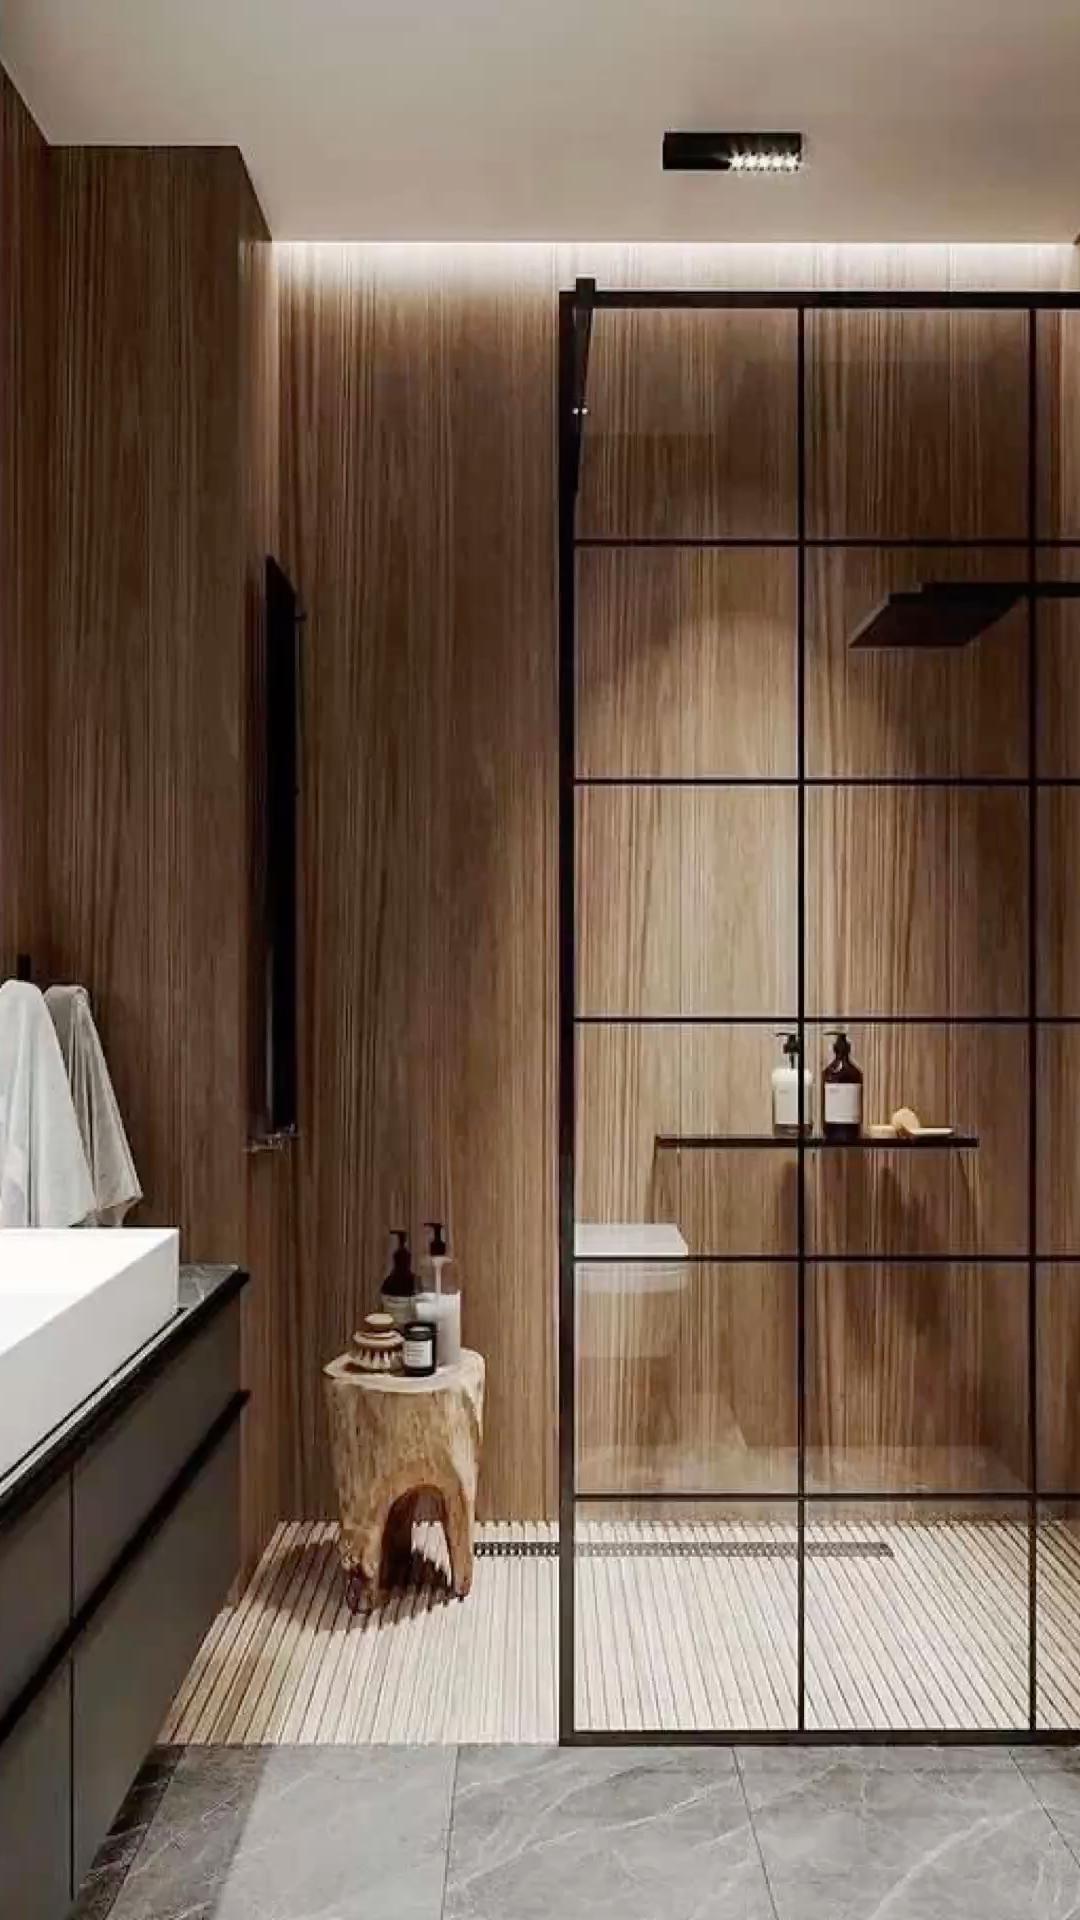 +10 Modern Bathroom design ideas